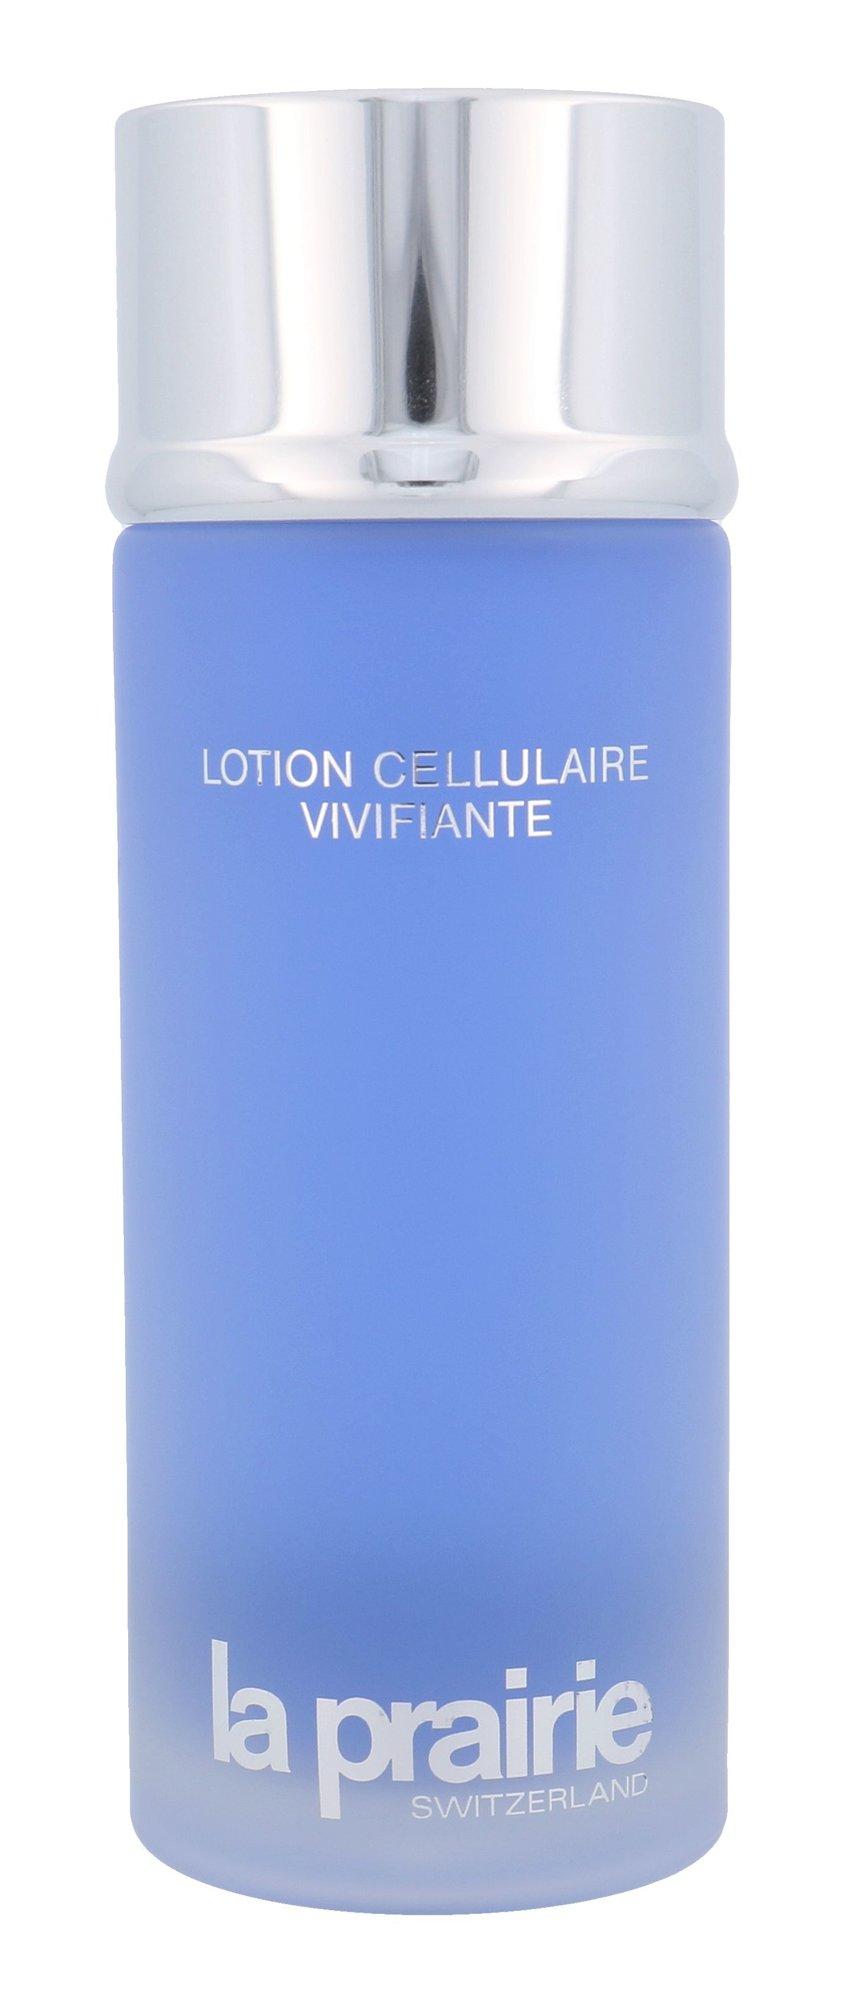 La Prairie Cellular Refining Lotion Cosmetic 250ml